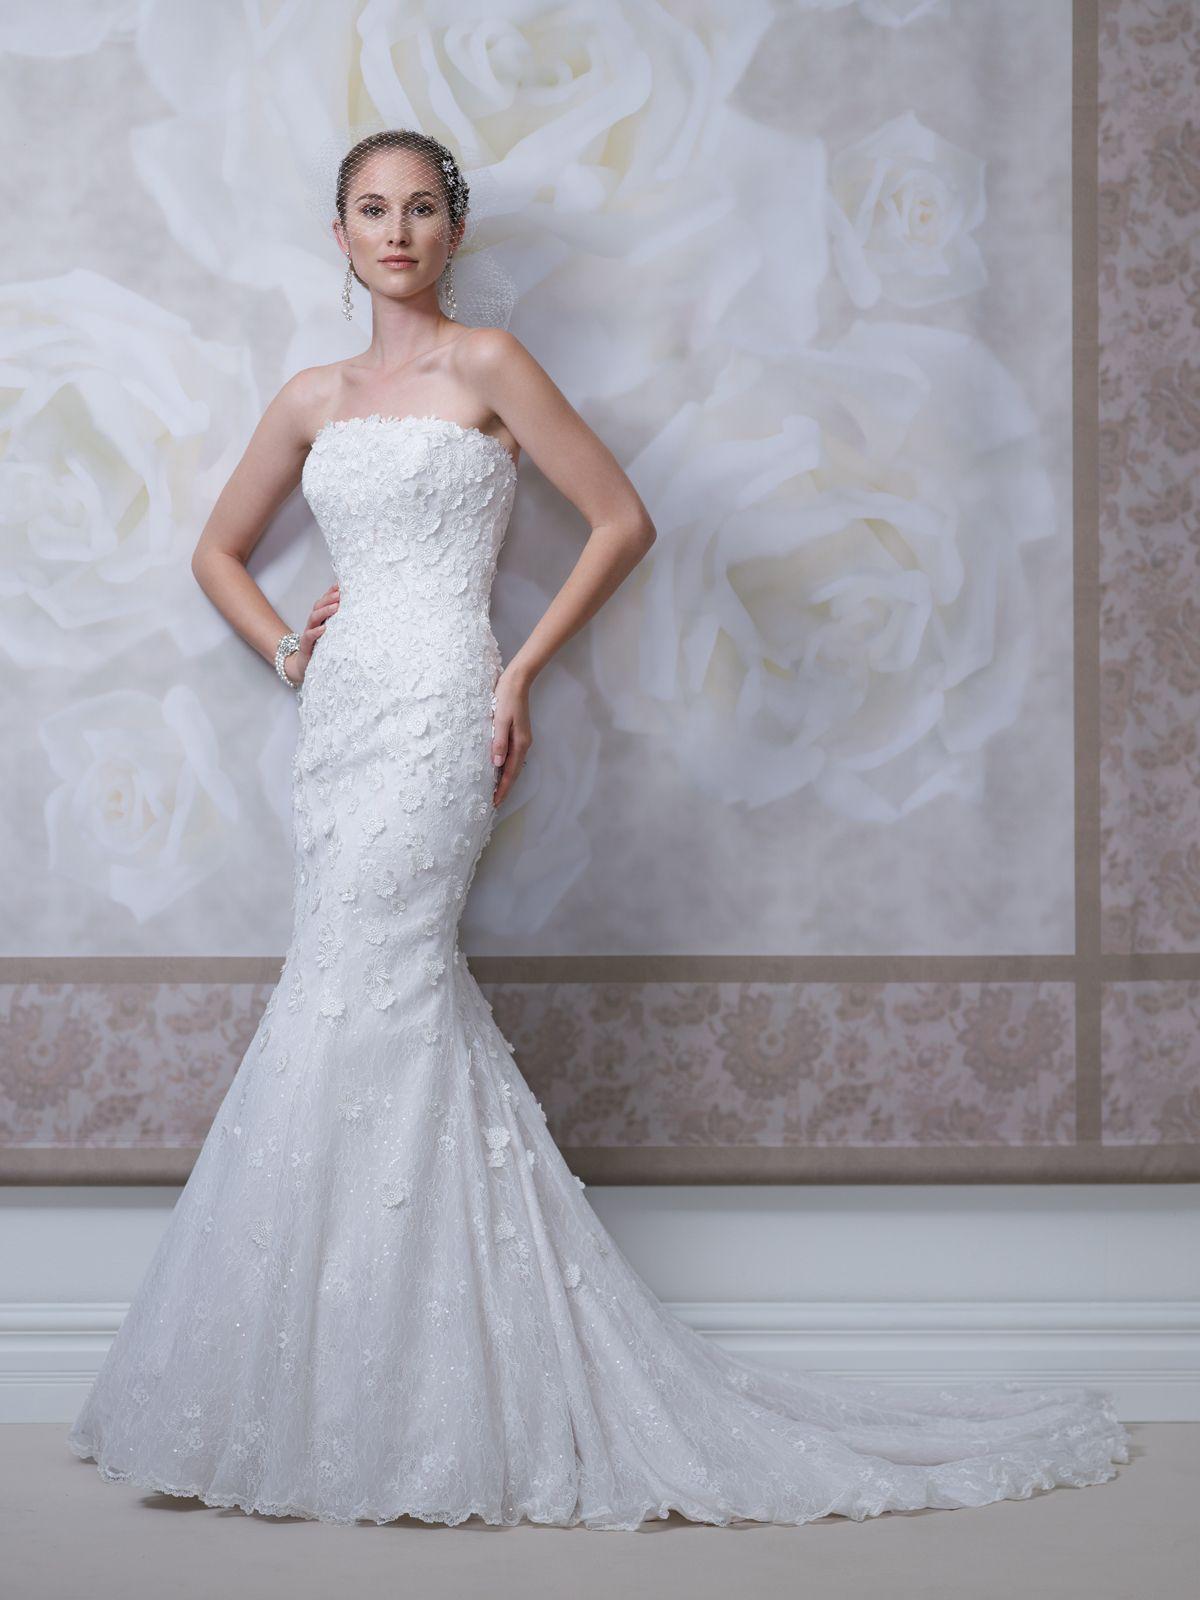 Wedding trends the wedding dresses youull kill for pinterest